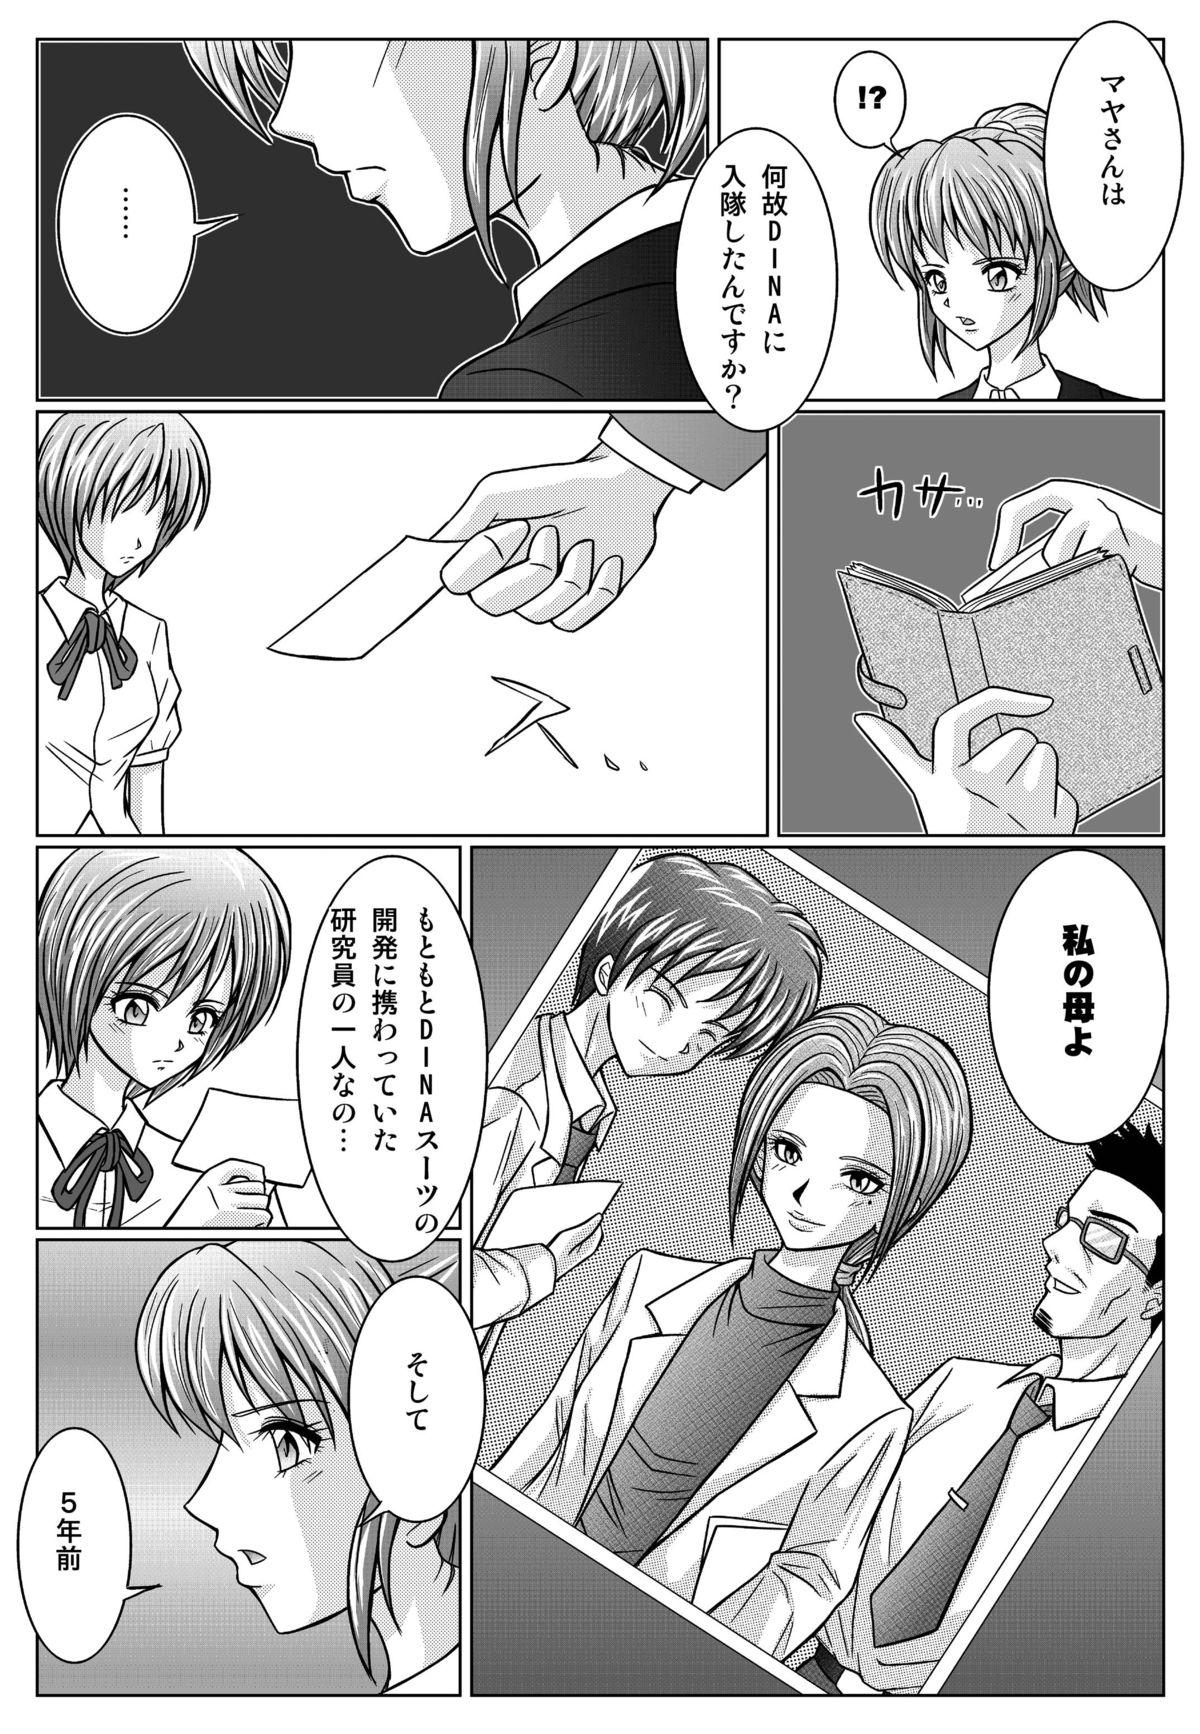 [Macxe's (monmon)] Tokubousentai Dinaranger ~Heroine Kairaku Sennou Keikaku~ Vol.01/02/03 (Renkaban) [Digital] 80